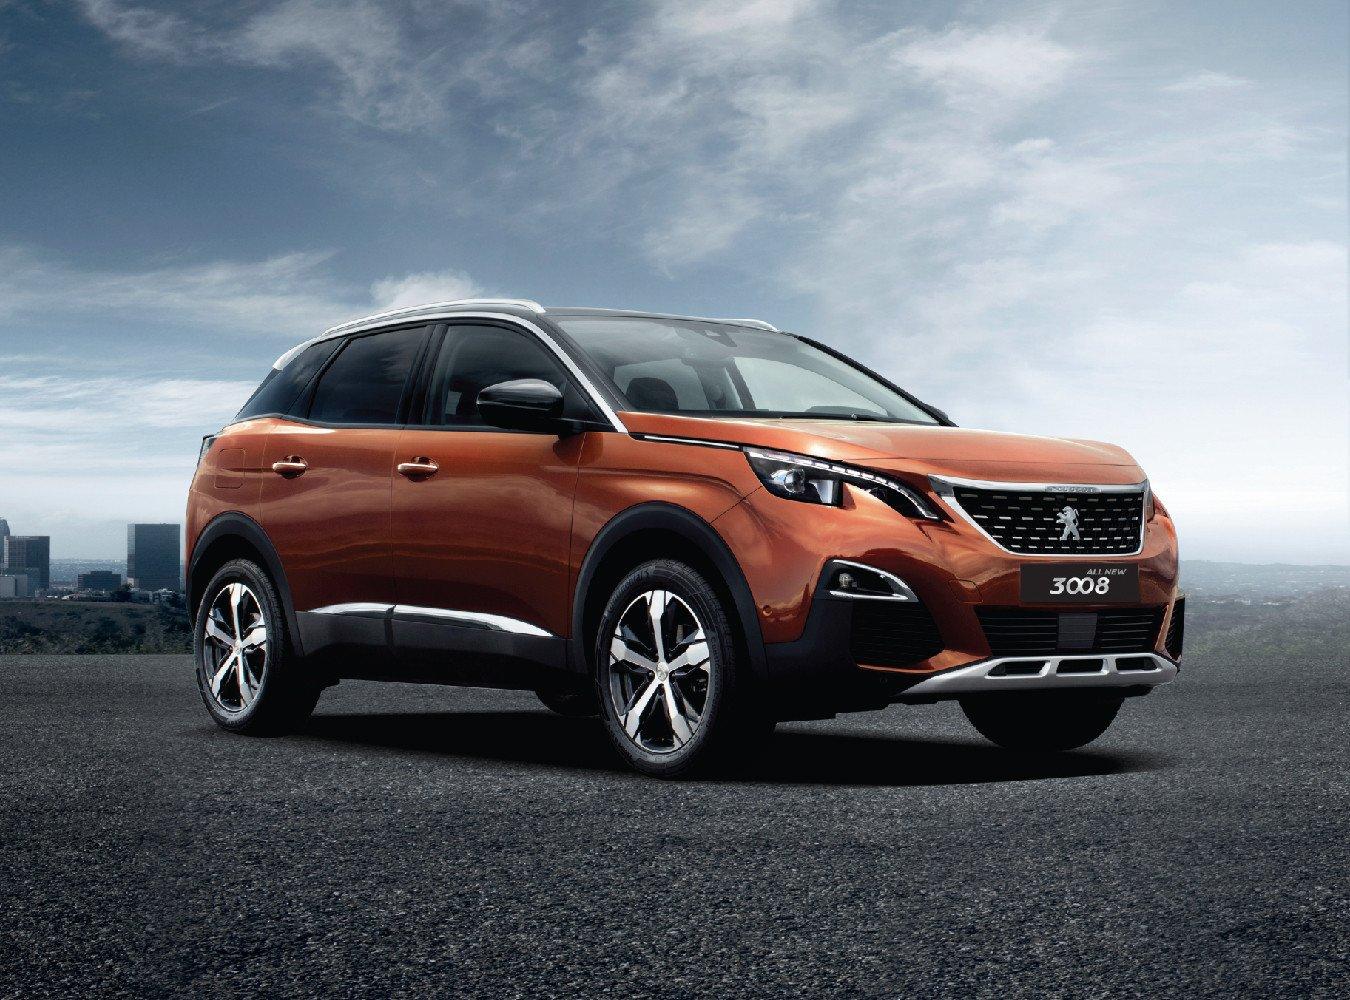 Đánh giá Peugeot 3008